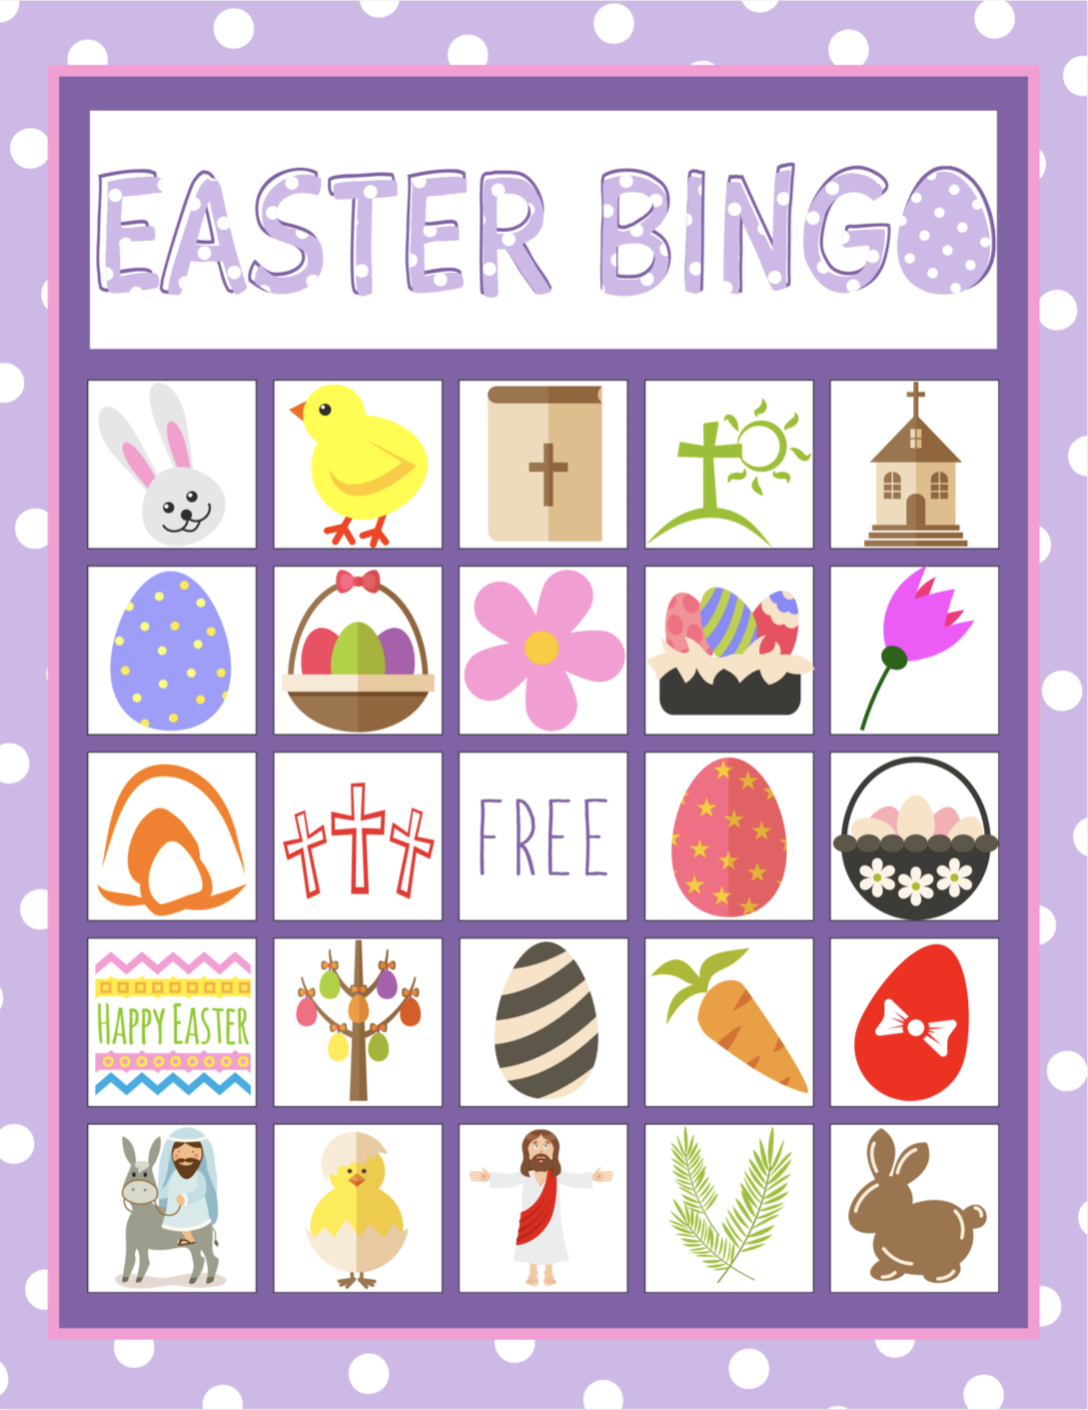 Easter Bingo Game For Kids | Easter Bingo, Bingo Games For